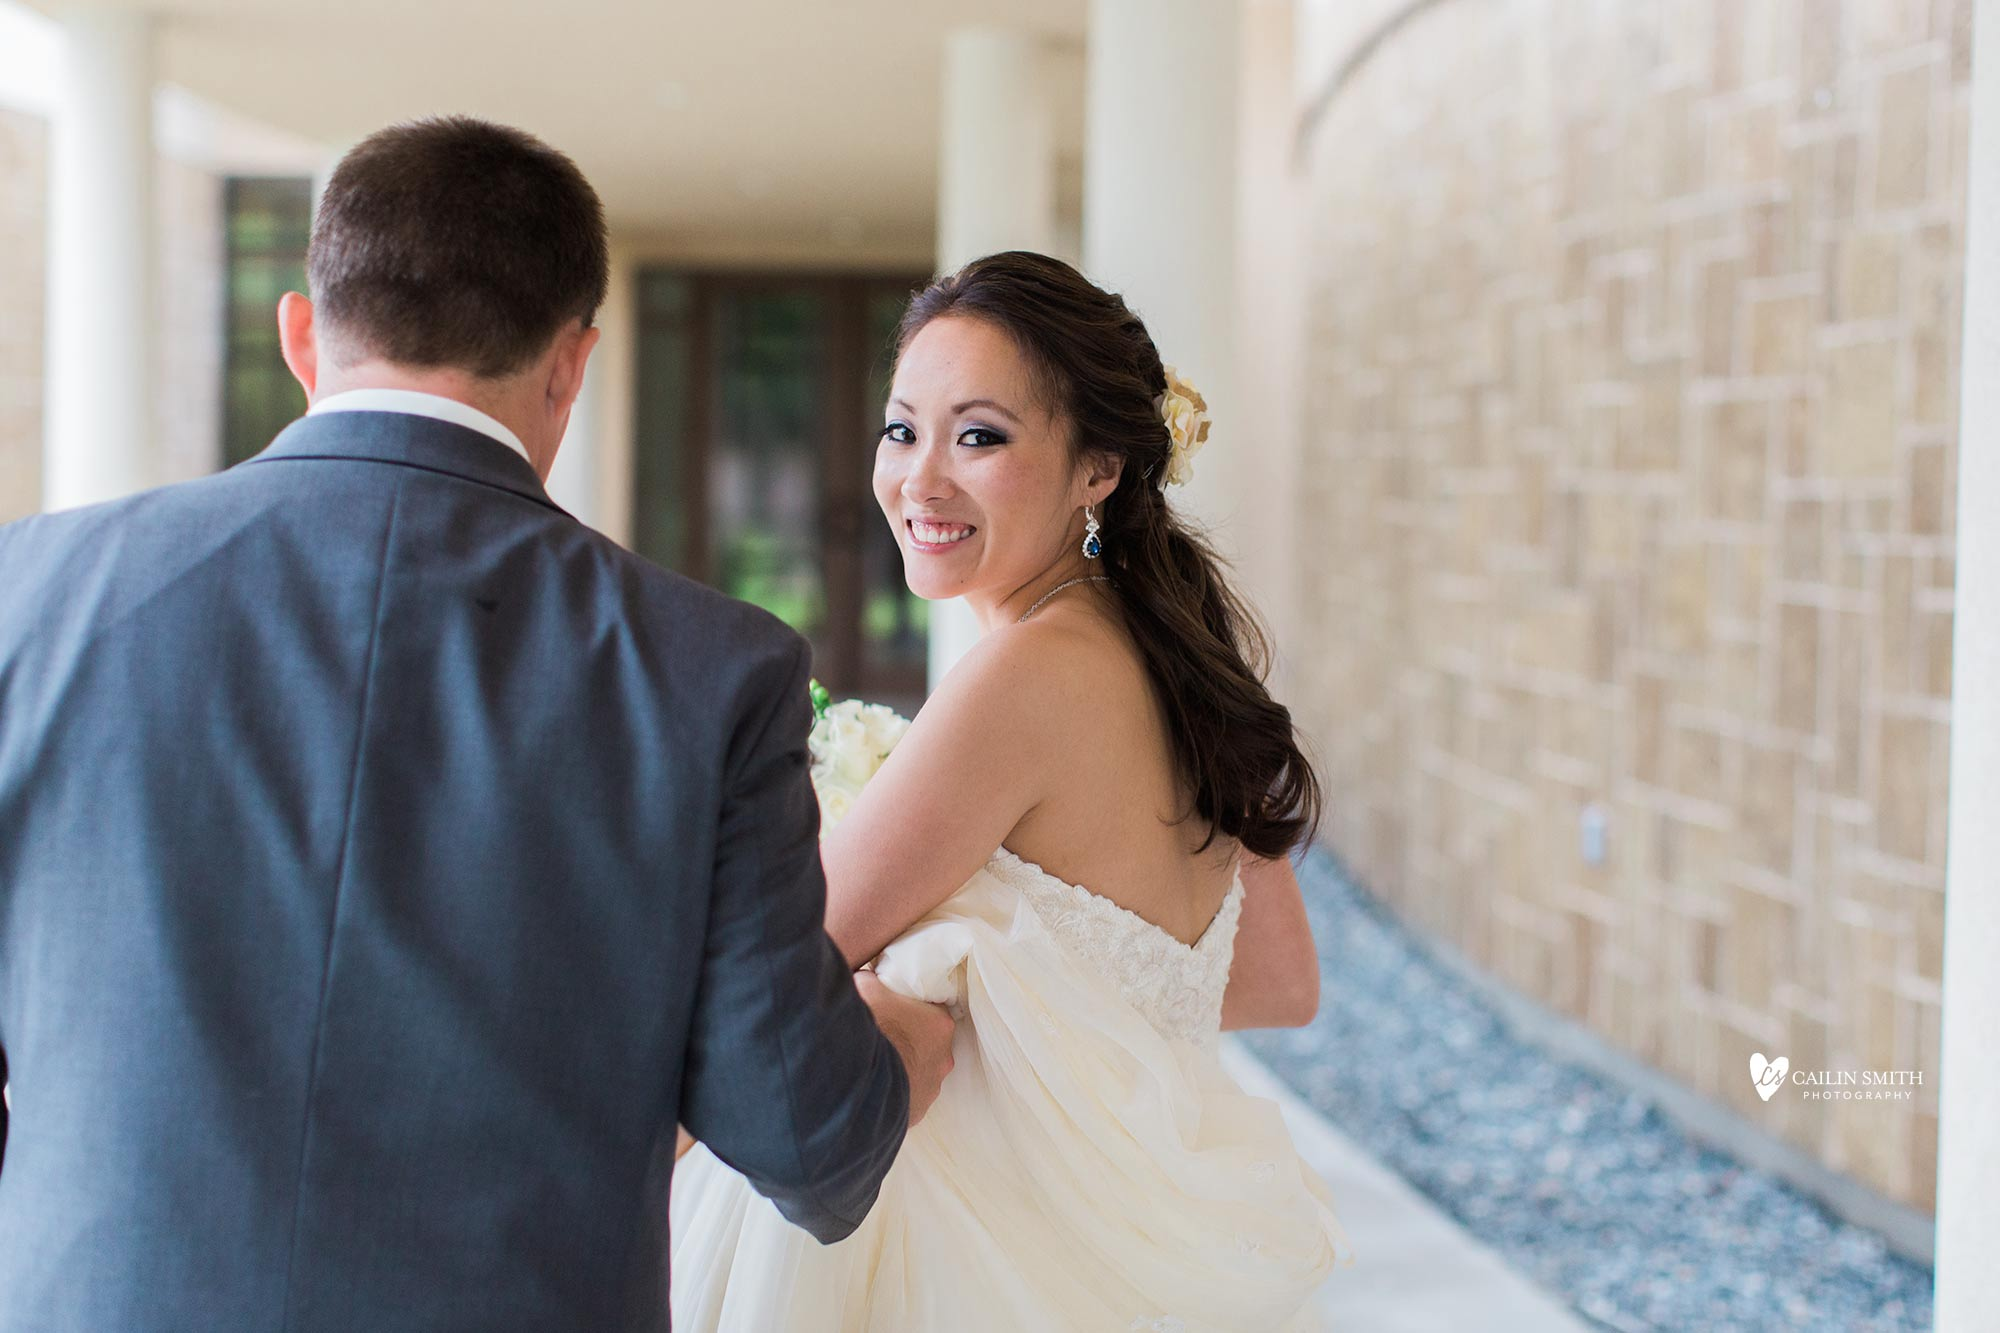 Jenifer_Dewey_Treasury_on_The_Plaza_Wedding_Photography_046.jpg